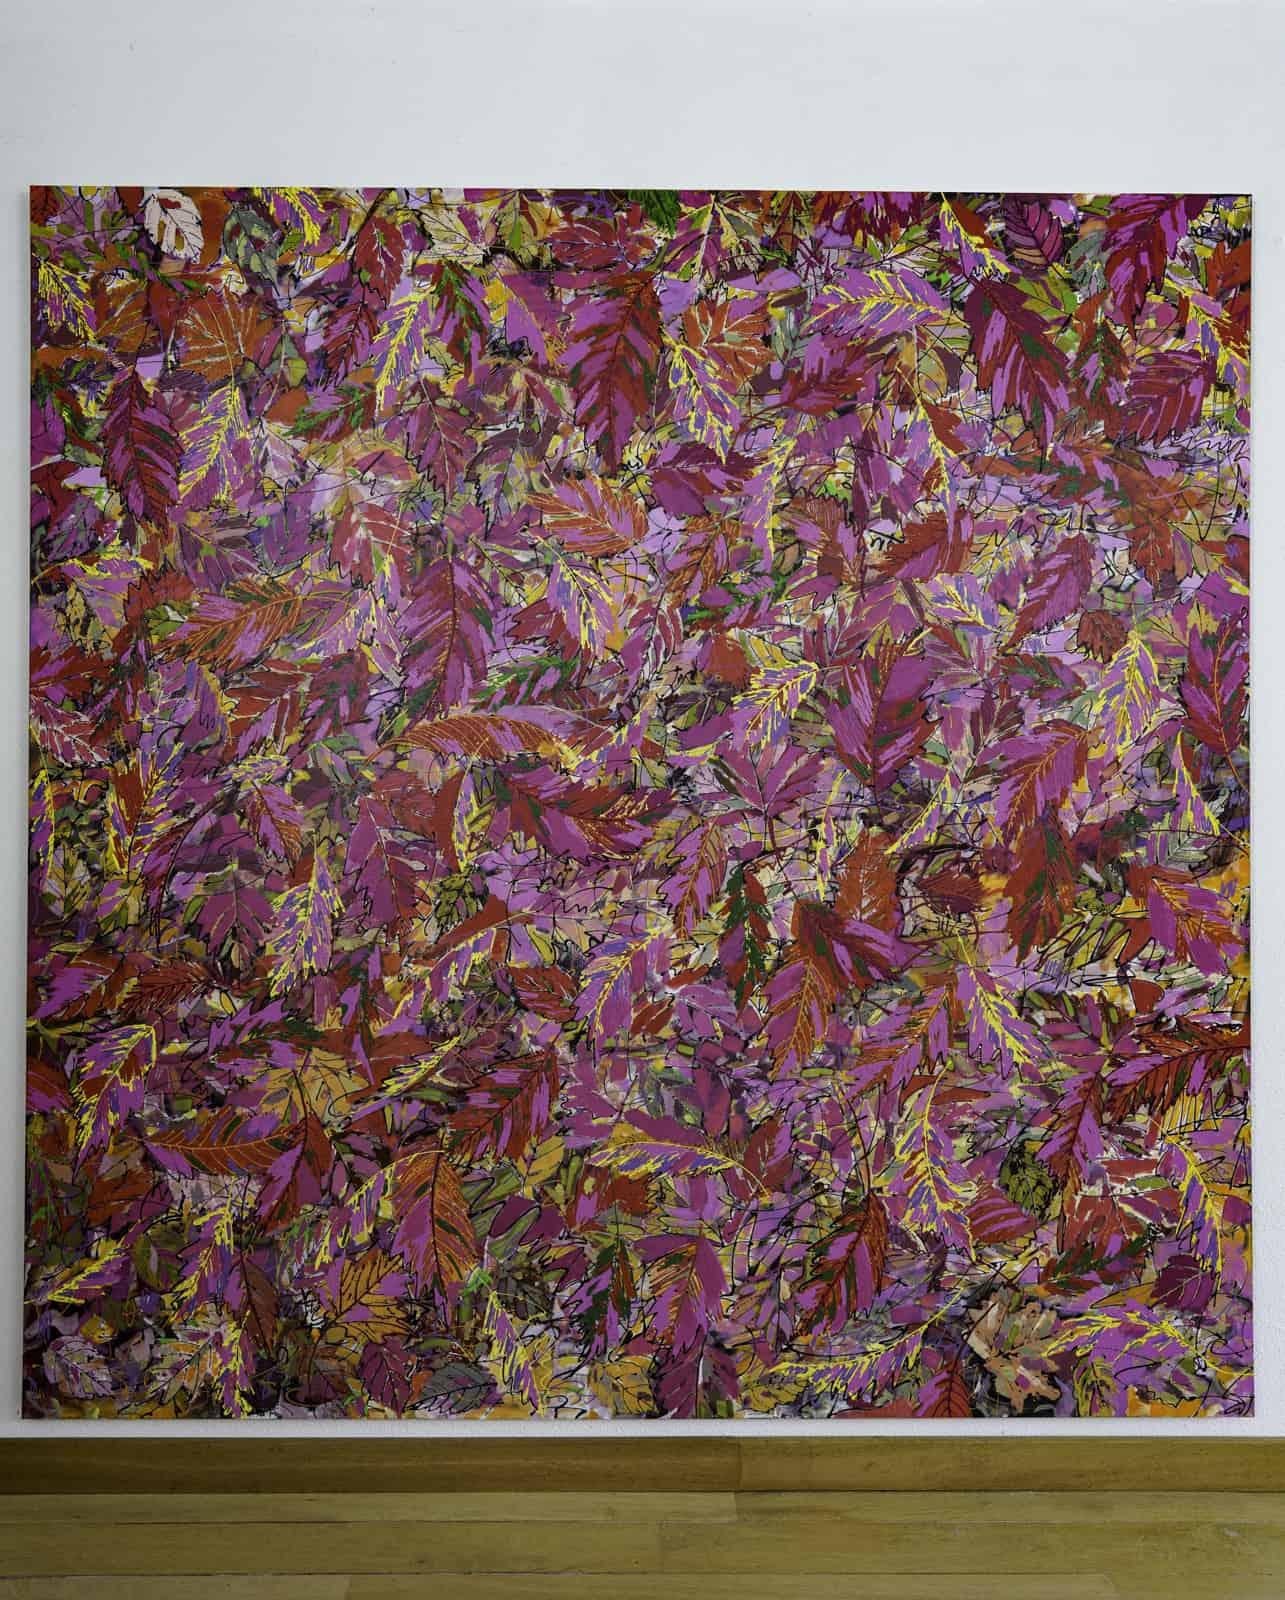 f7-3_Autumn-2019-5_200x200-acrylic-on-canvas_FRONT